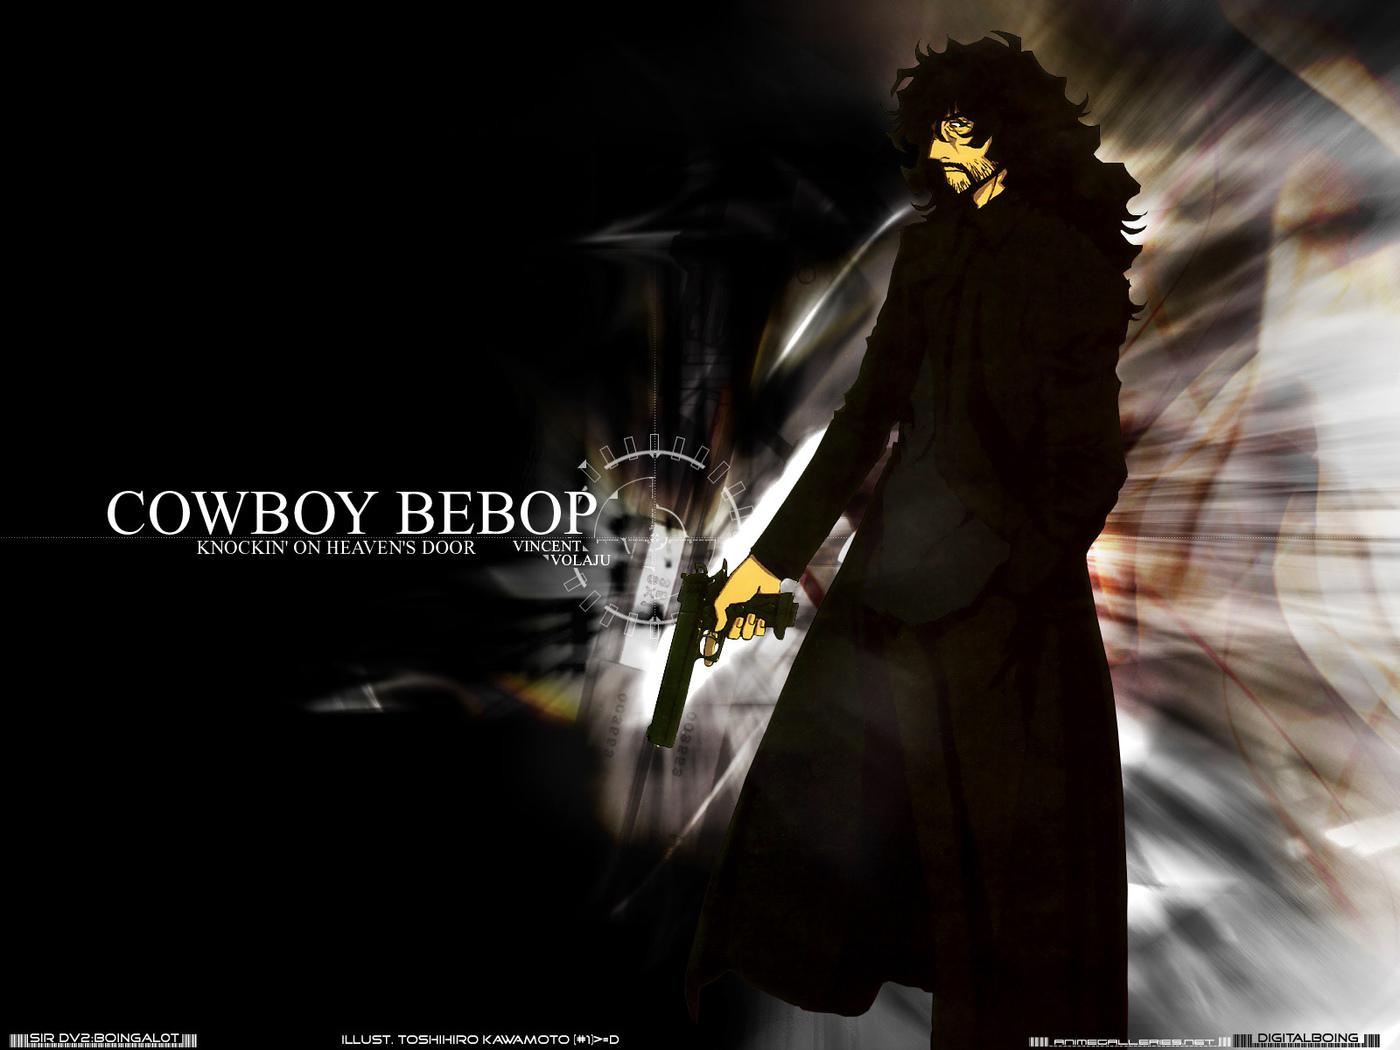 Cowboy Bebop Anime Wallpaper # 81